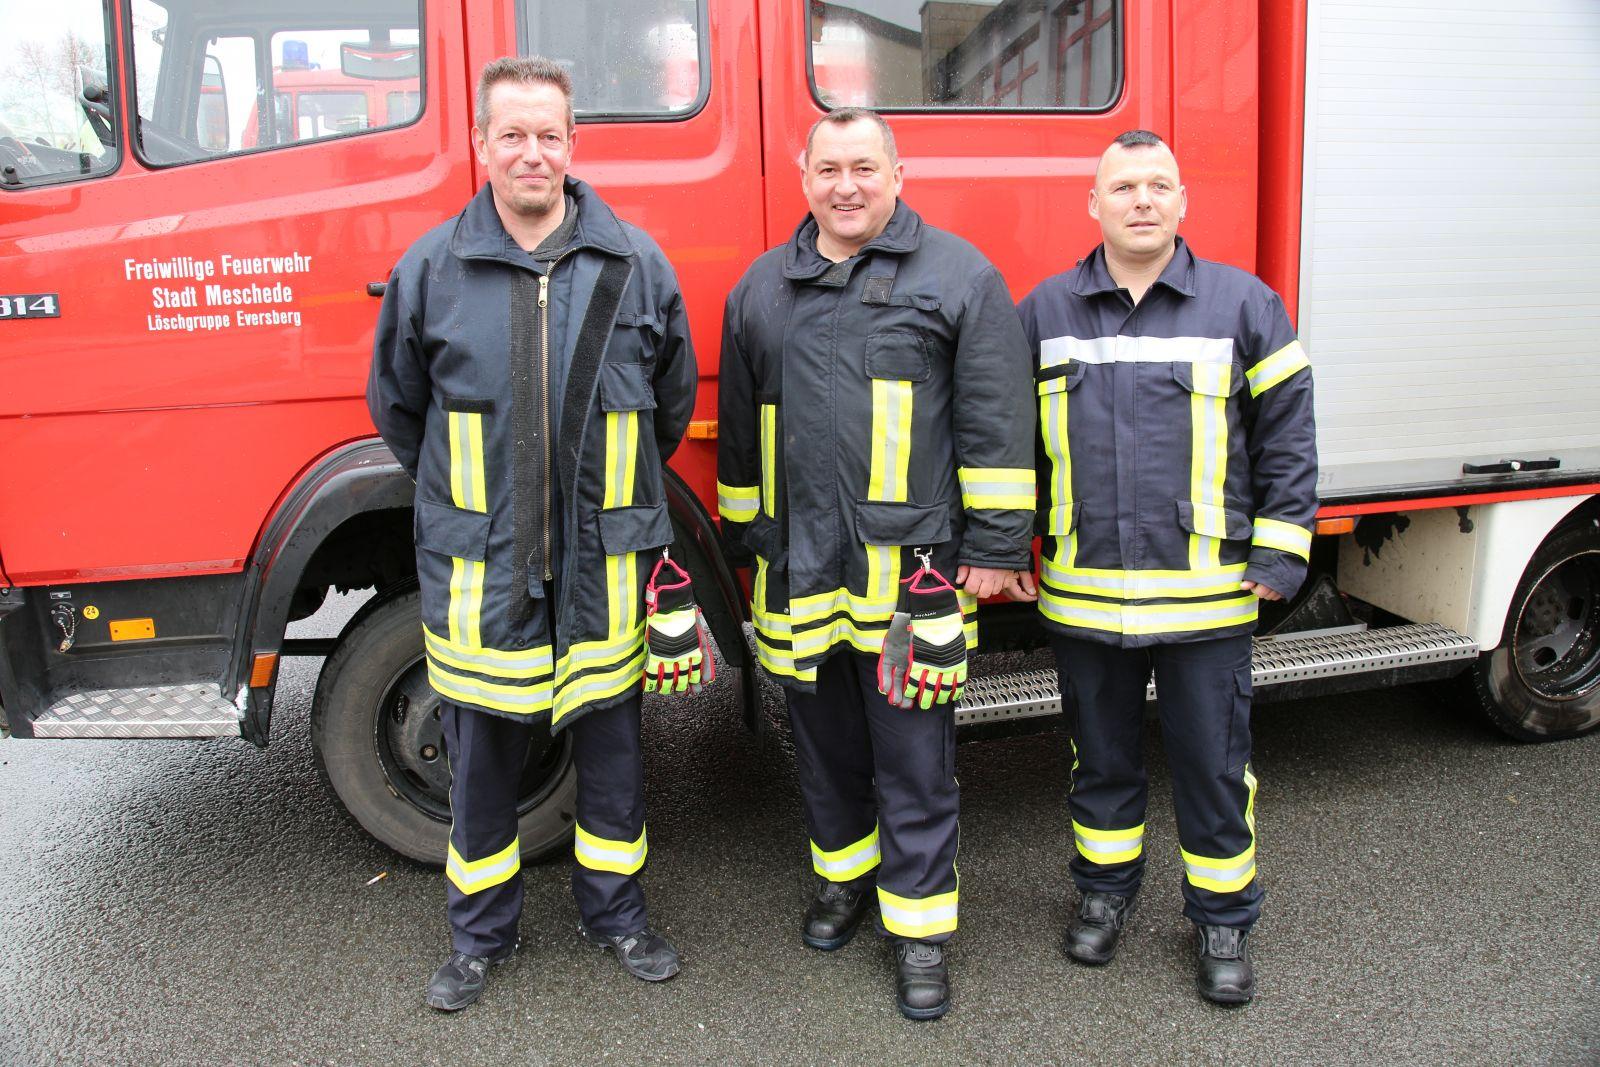 Die ältesten Teilnehmer: Marcus Knipschild LG Eversberg, Rafael Czochara LG Eversberg , Karsten Pöttgen LZ Freienohl